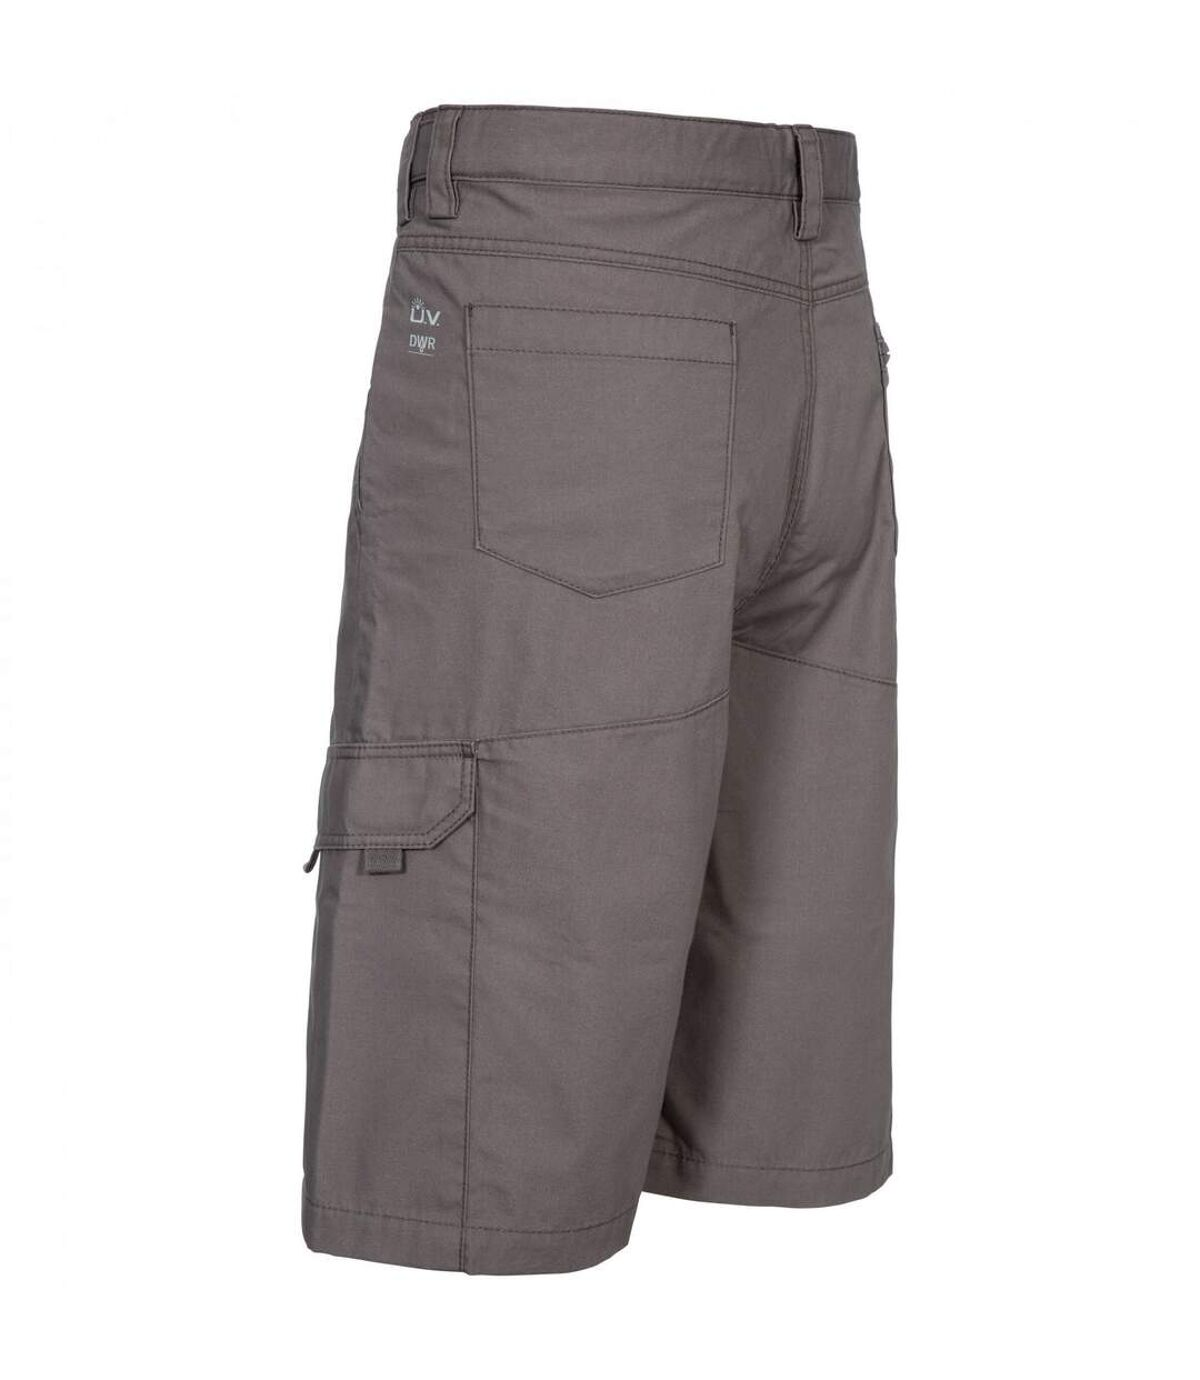 Trespass Mens Regulate Adventure Shorts (Bark) - UTTP4142